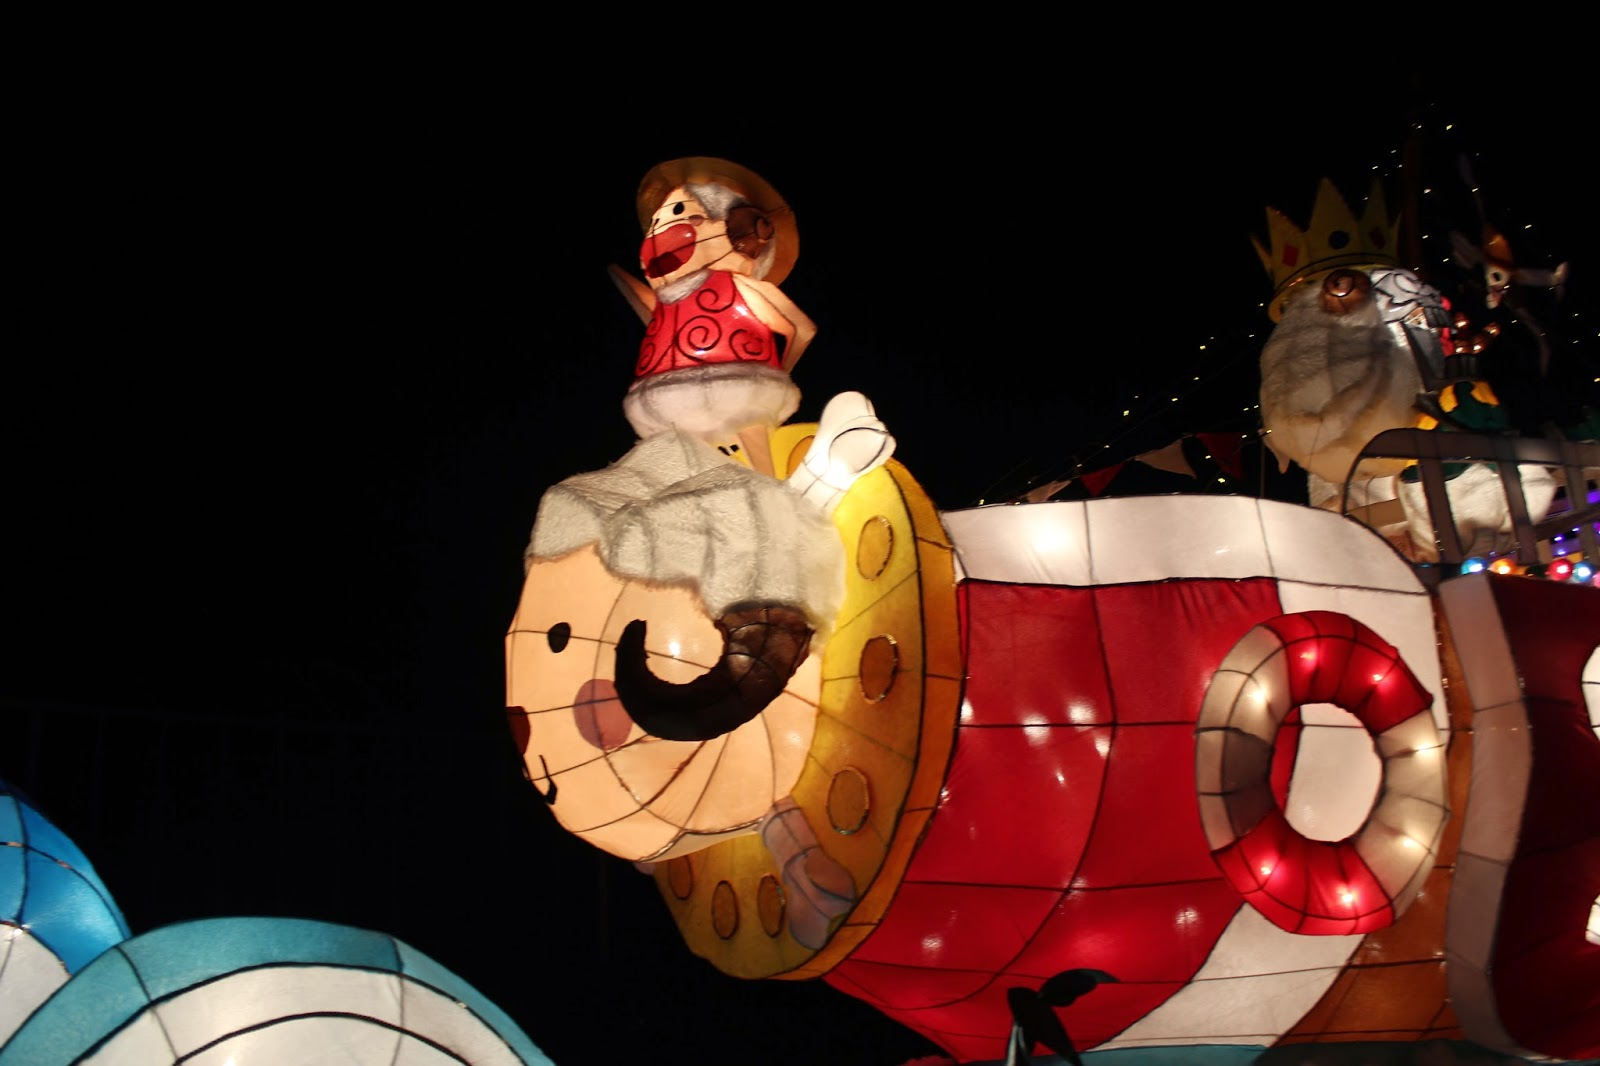 taiwan taipei lantern festival 2015 one piece ruffy